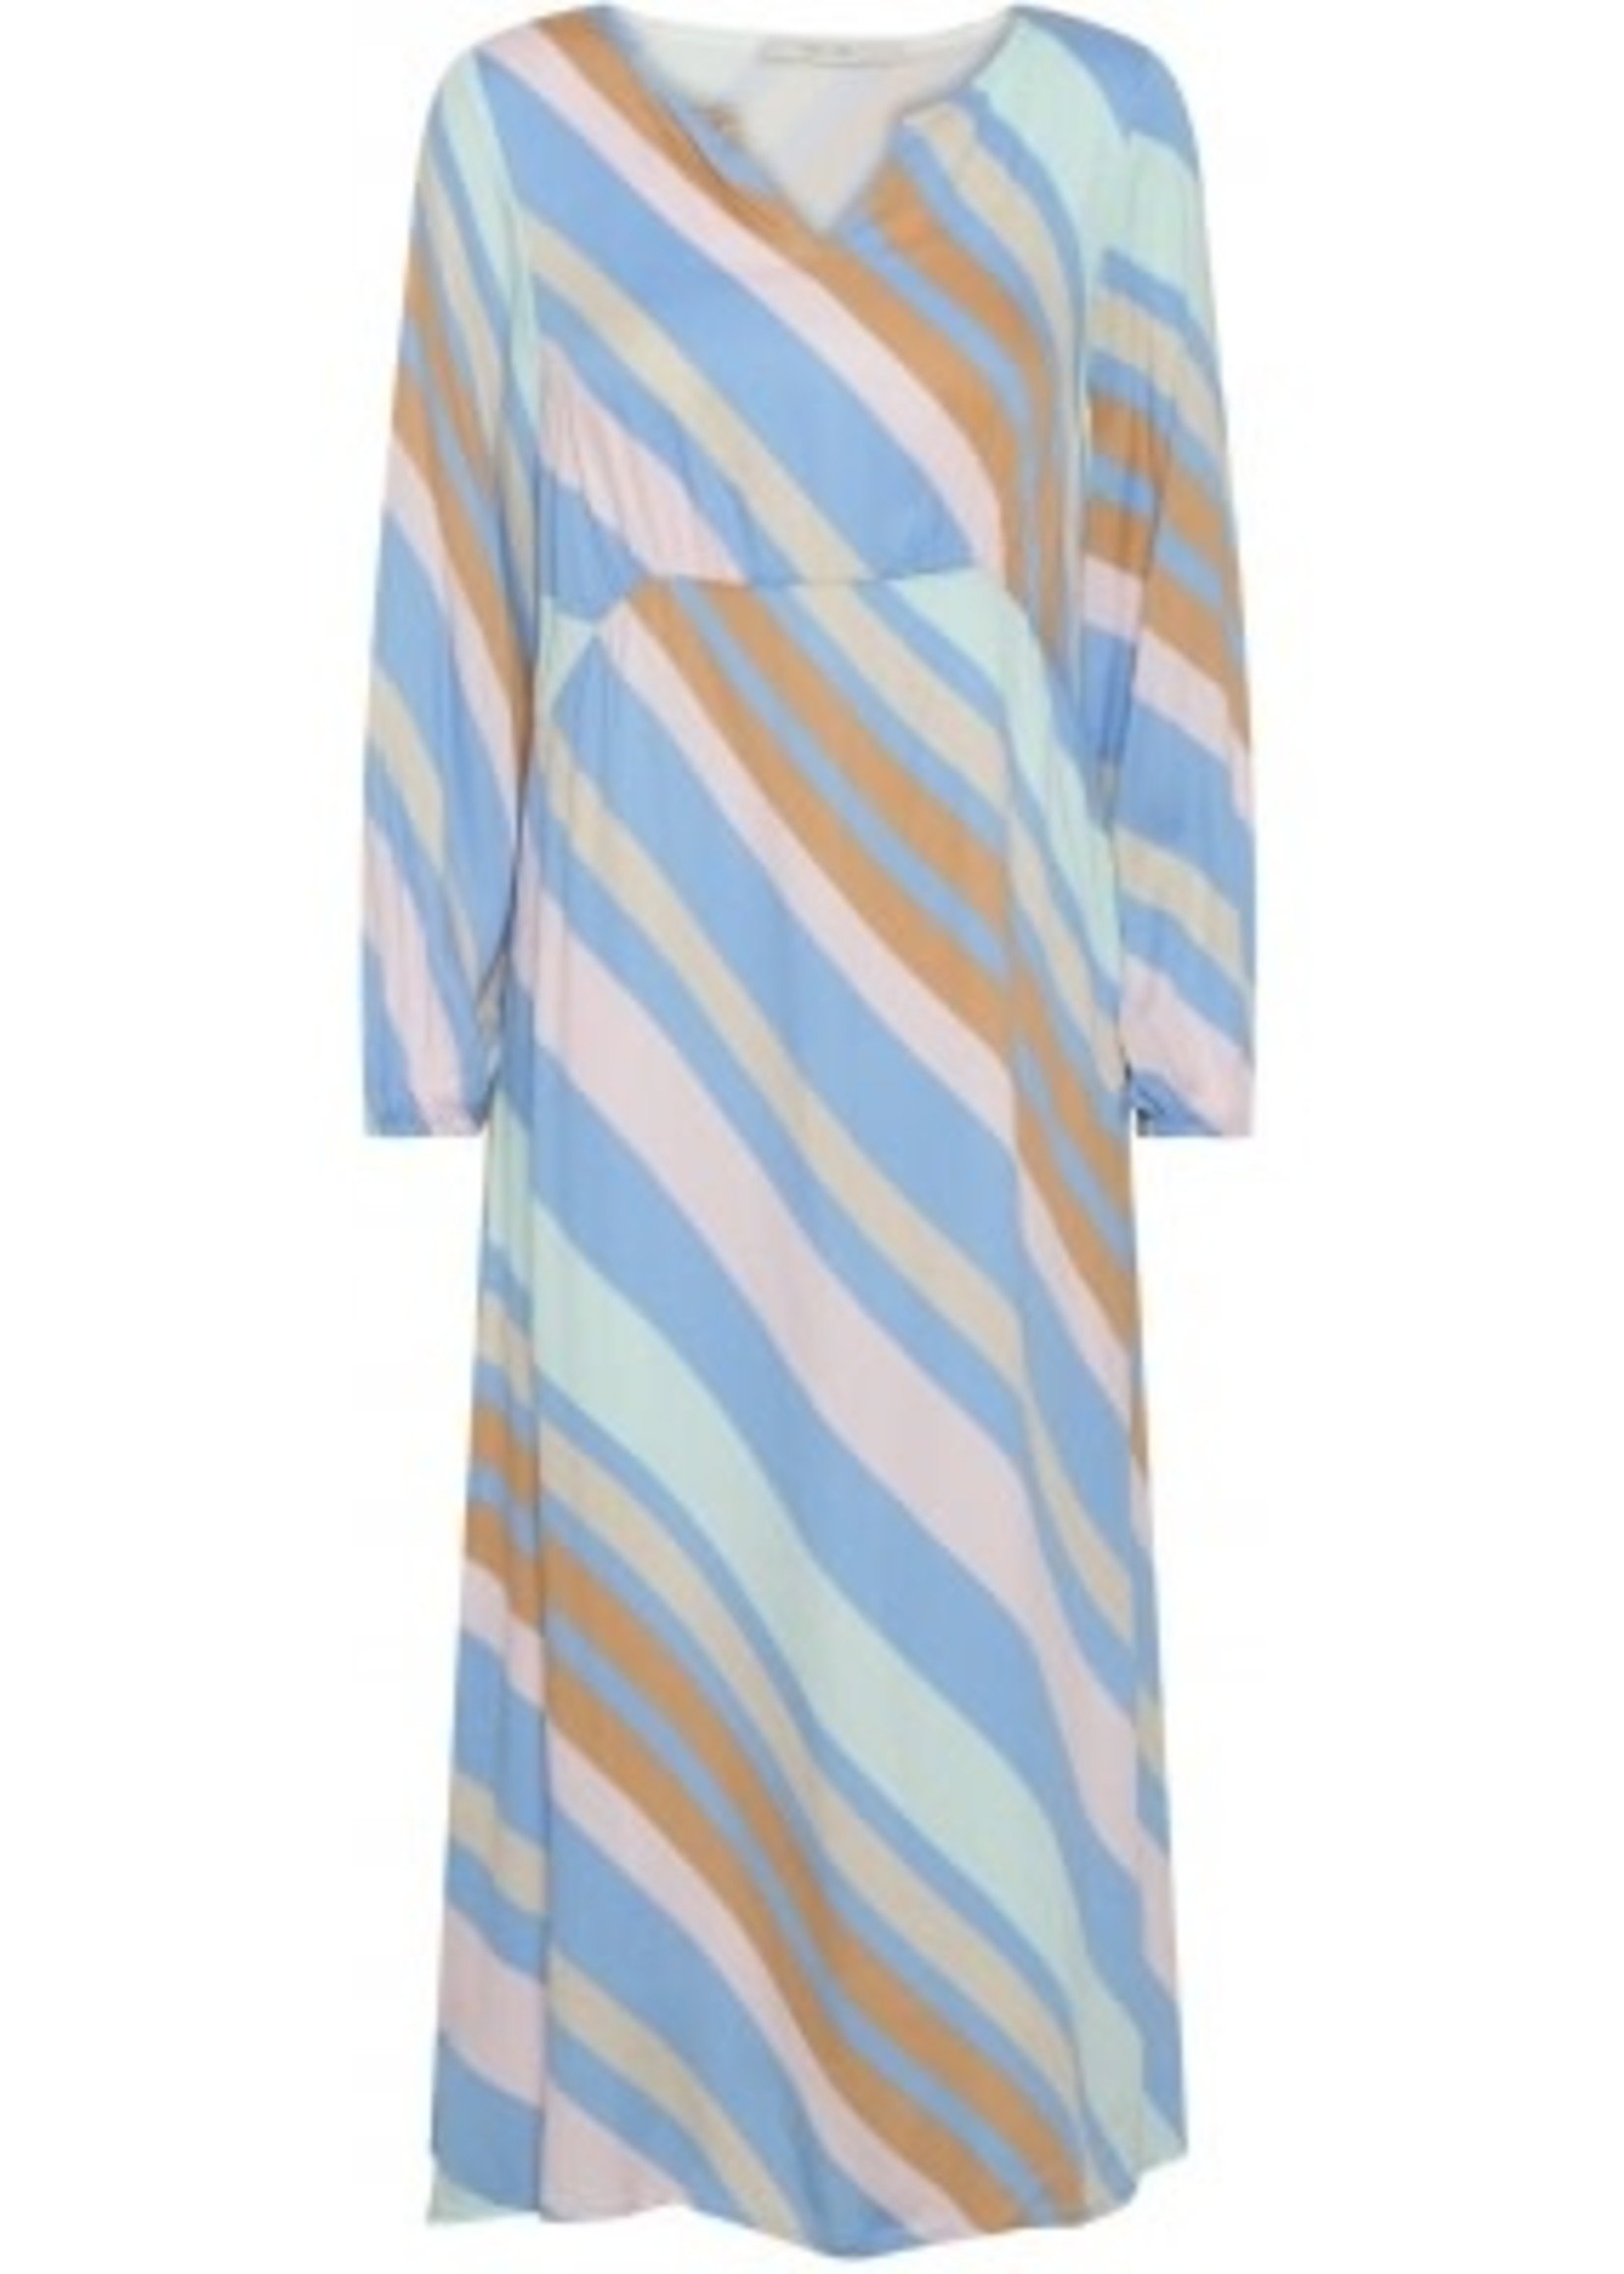 COSTAMANI Happy Dress multi Stripe